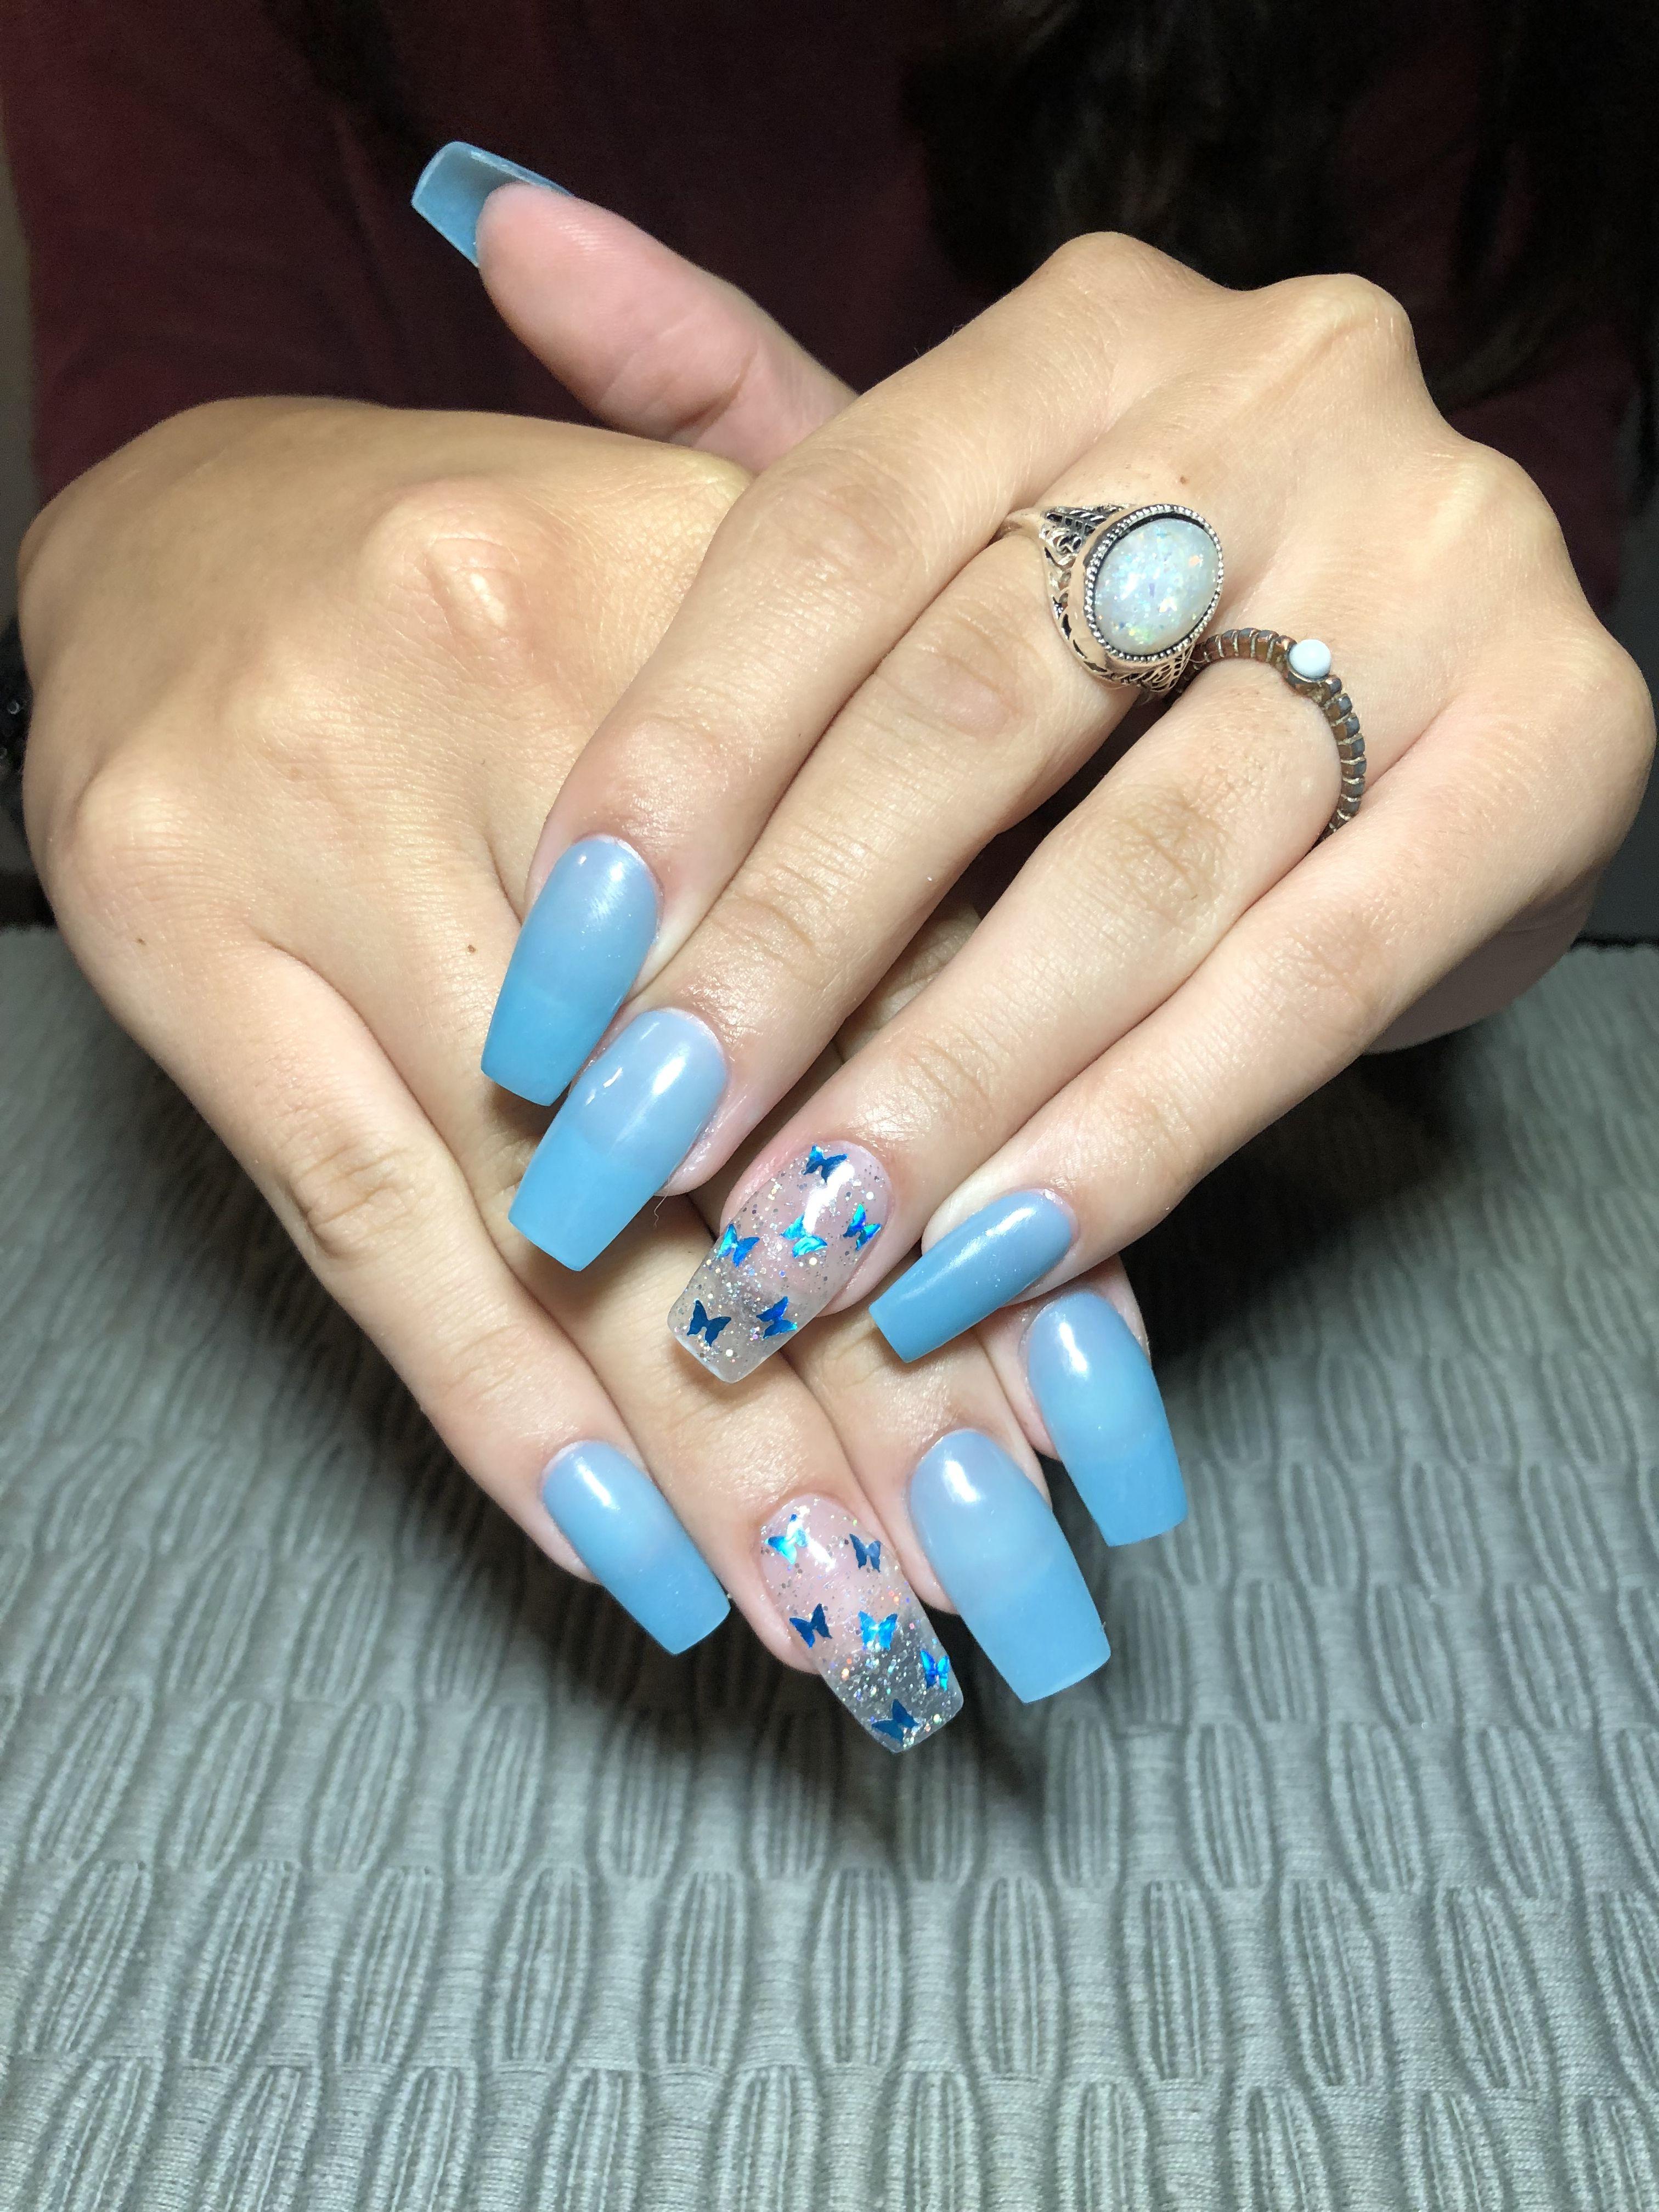 Blue Butterfly Acrylic Nails Blue Acrylic Nails Purple Acrylic Nails Short Square Acrylic Nails